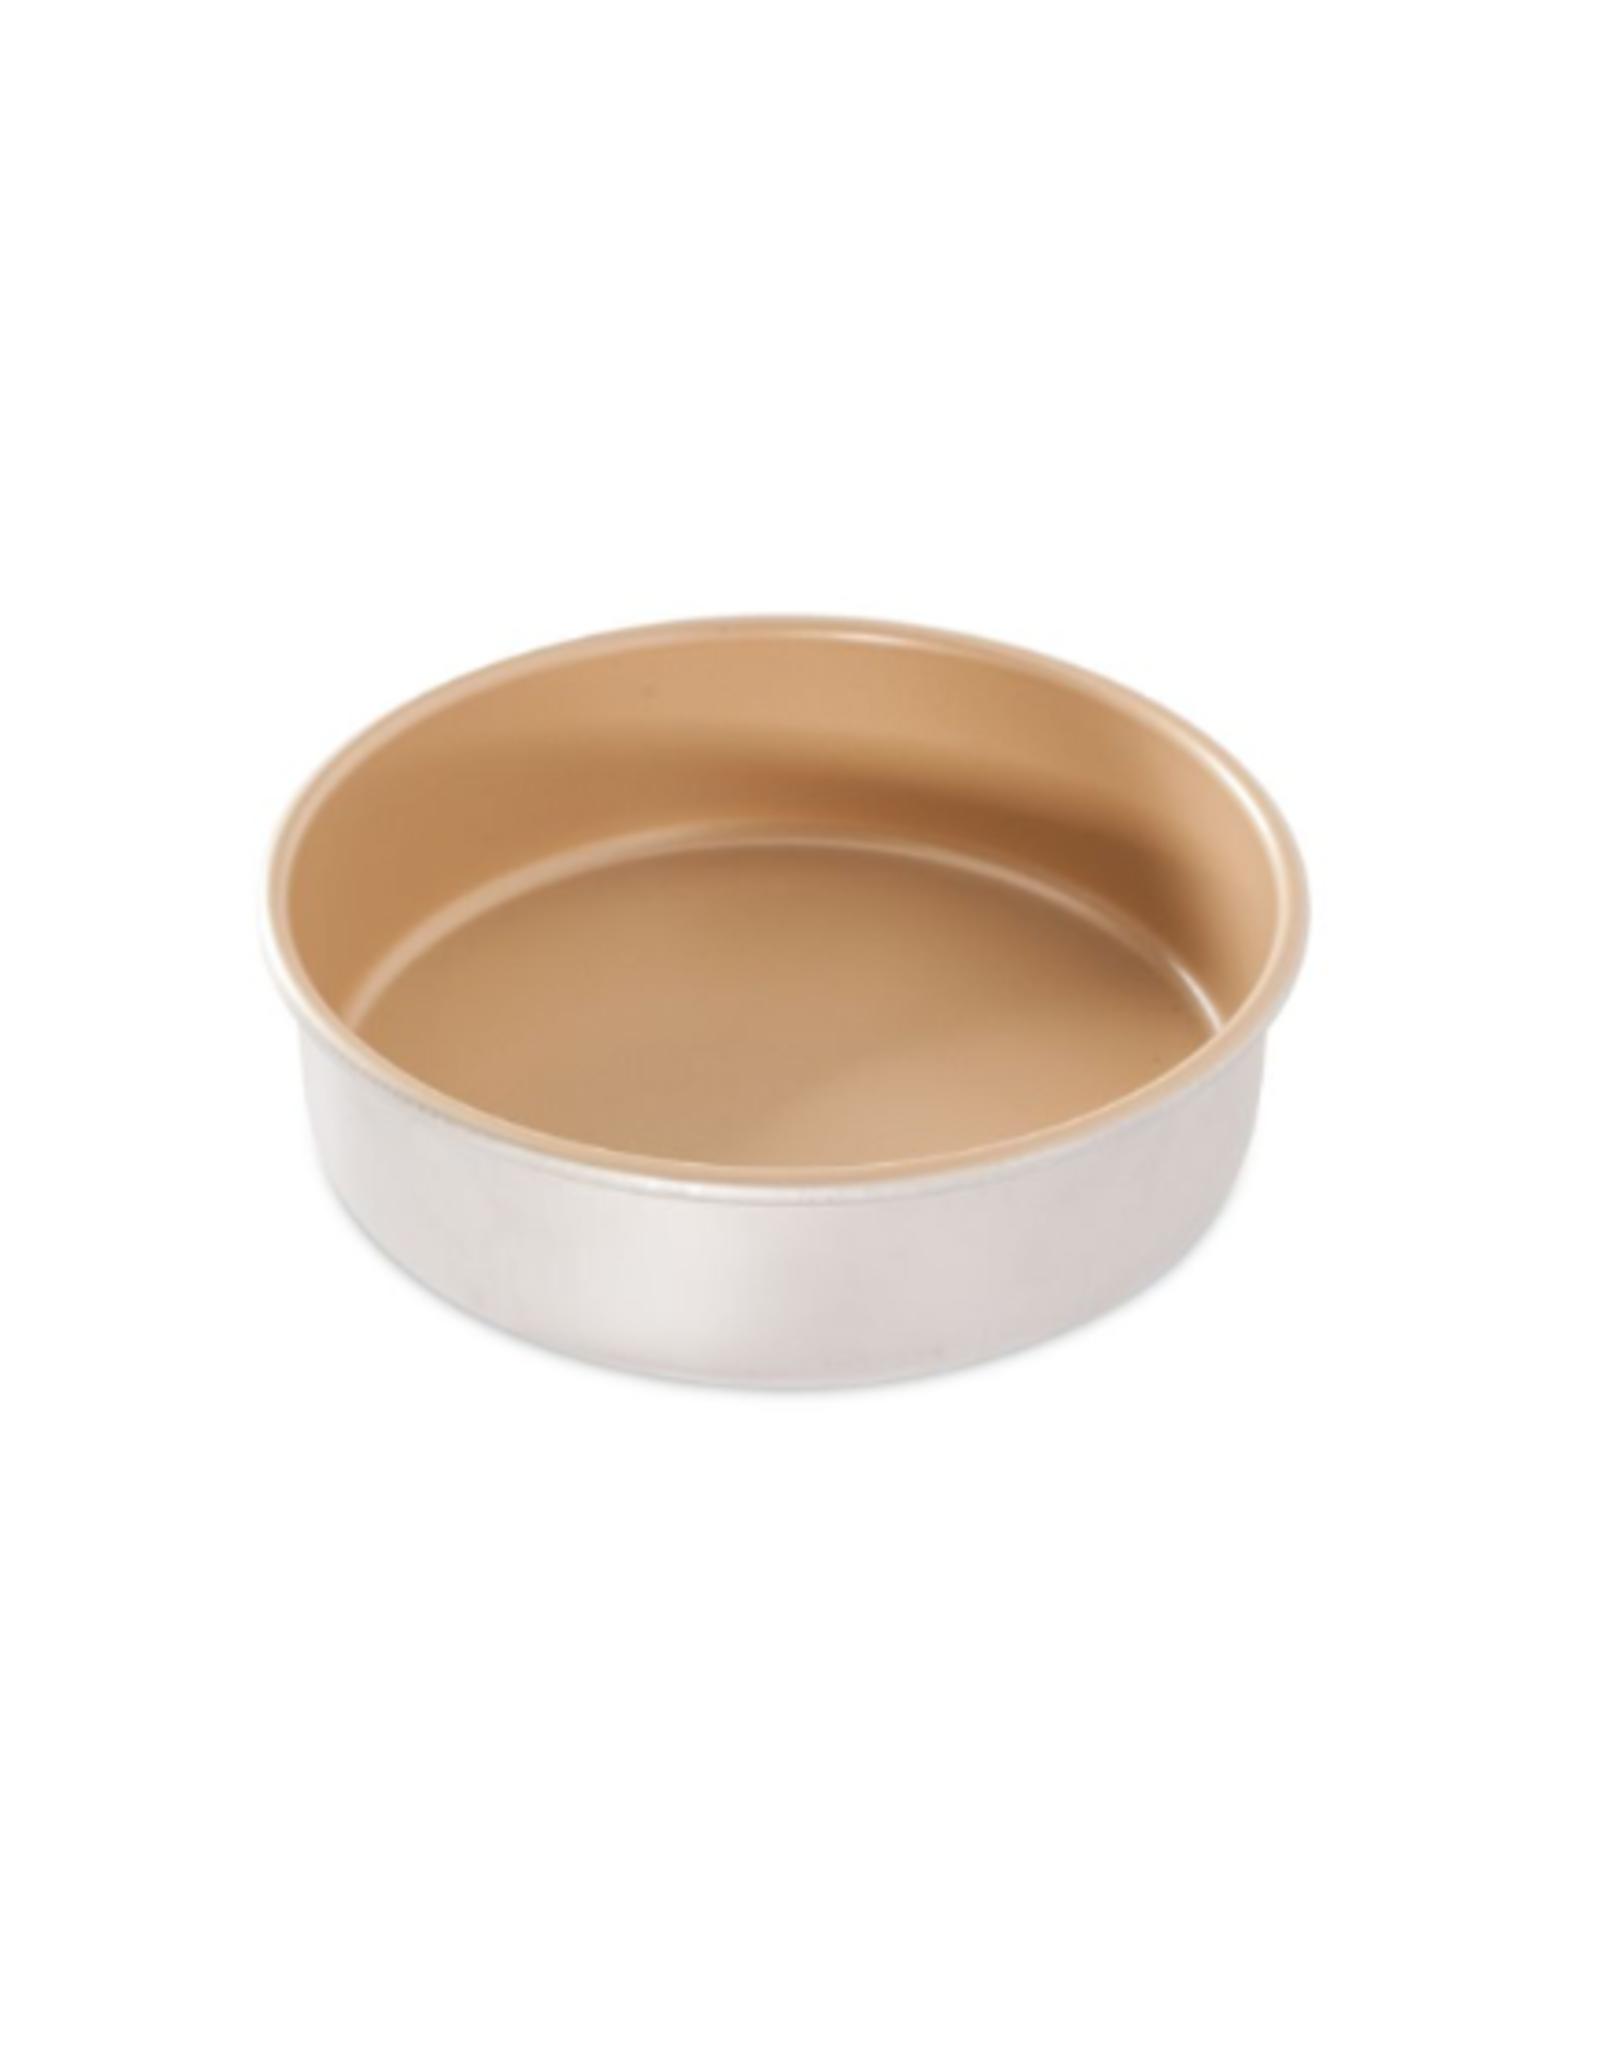 "Nordicware 9"" Layer Cake Pan, Gold"